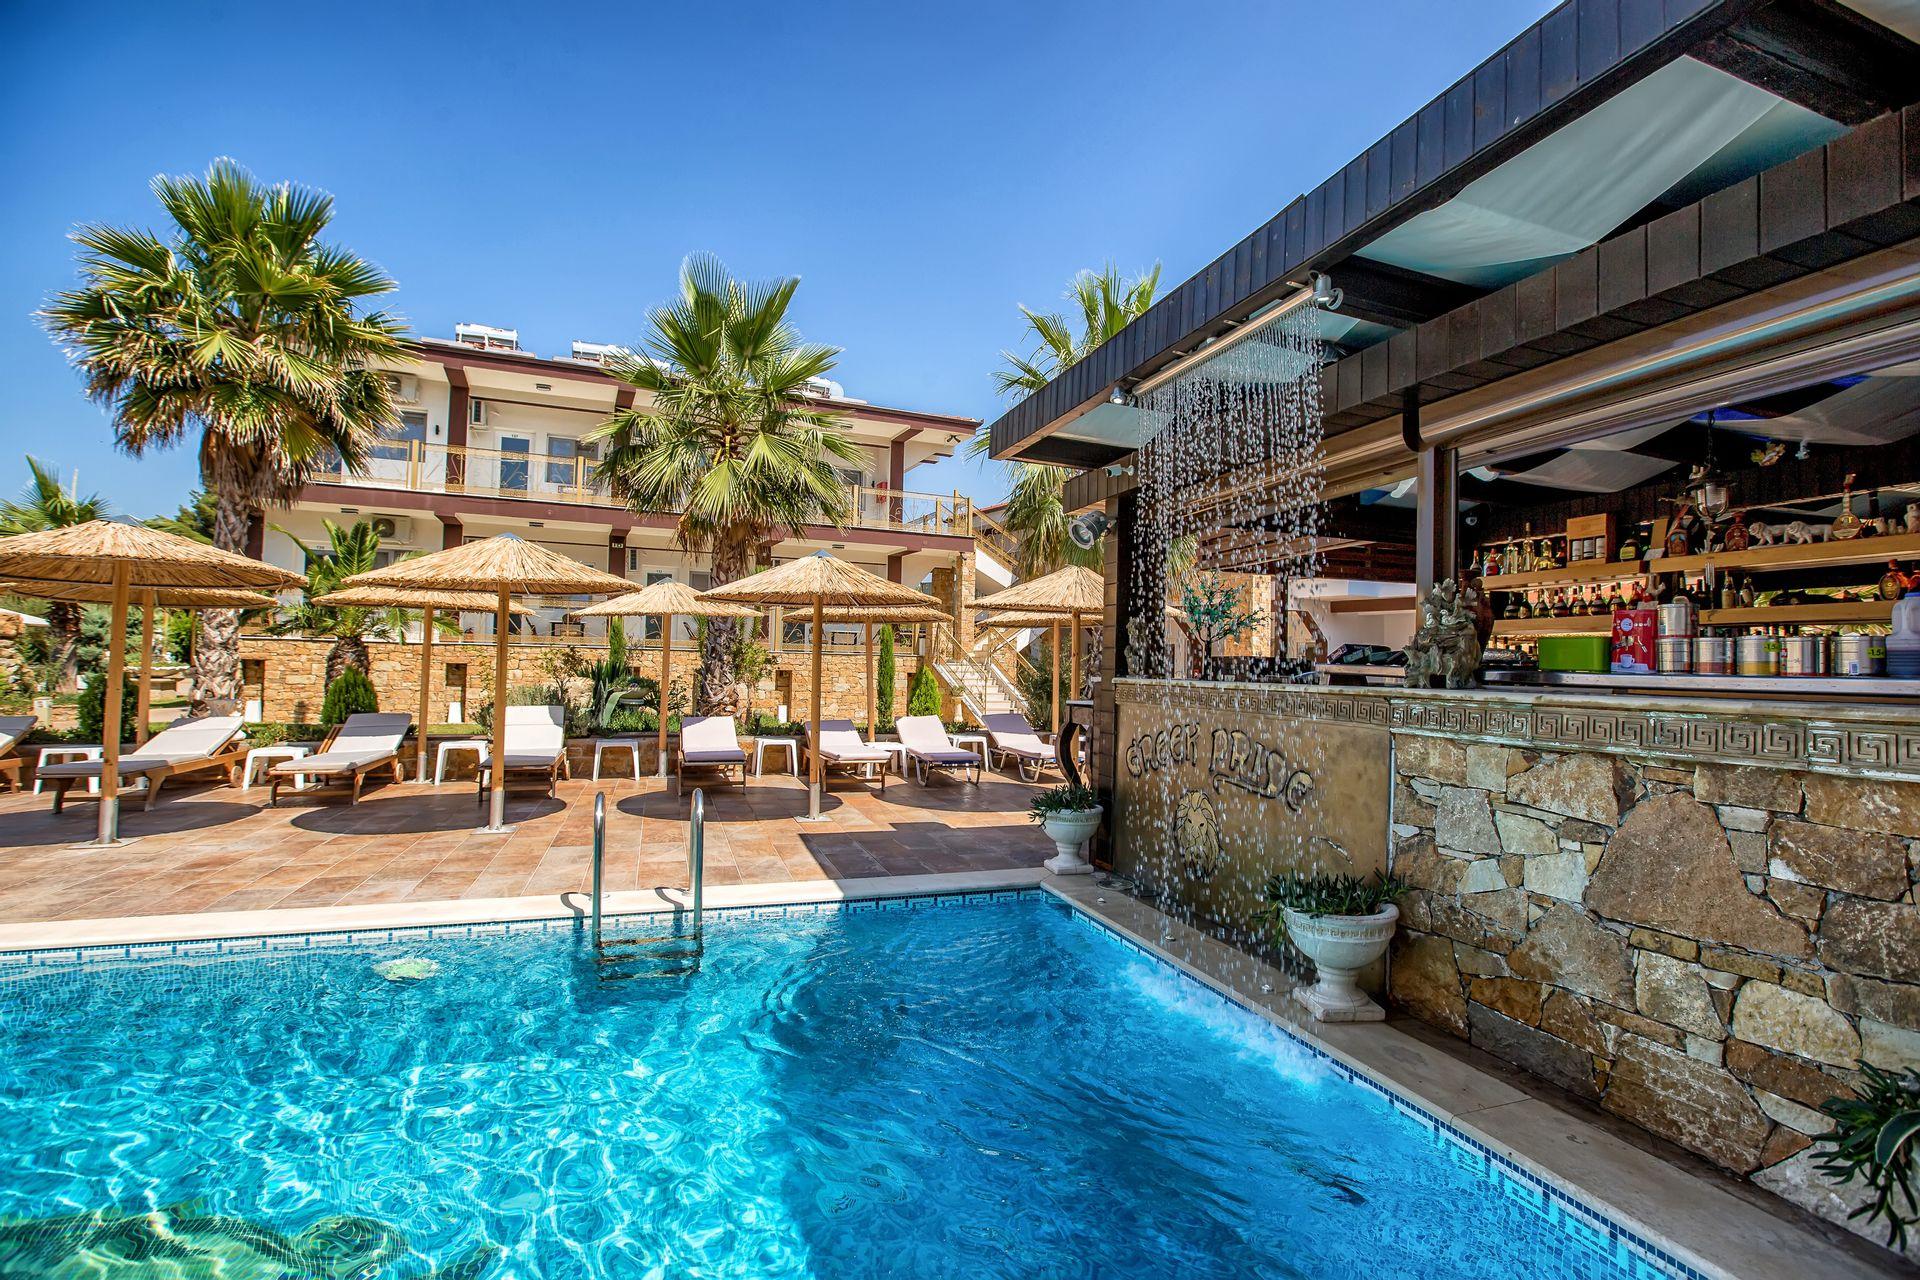 Greek Pride Hotel & Apartments - Παραλία Φούρκας, Χαλκιδική ✦ 3 Ημέρες (2 Διανυκτερεύσεις) ✦ 2 άτομα ✦ Χωρίς Πρωινό ✦ 01/09/2021 έως 30/09/2021 ✦ Μπροστά στην παραλία!